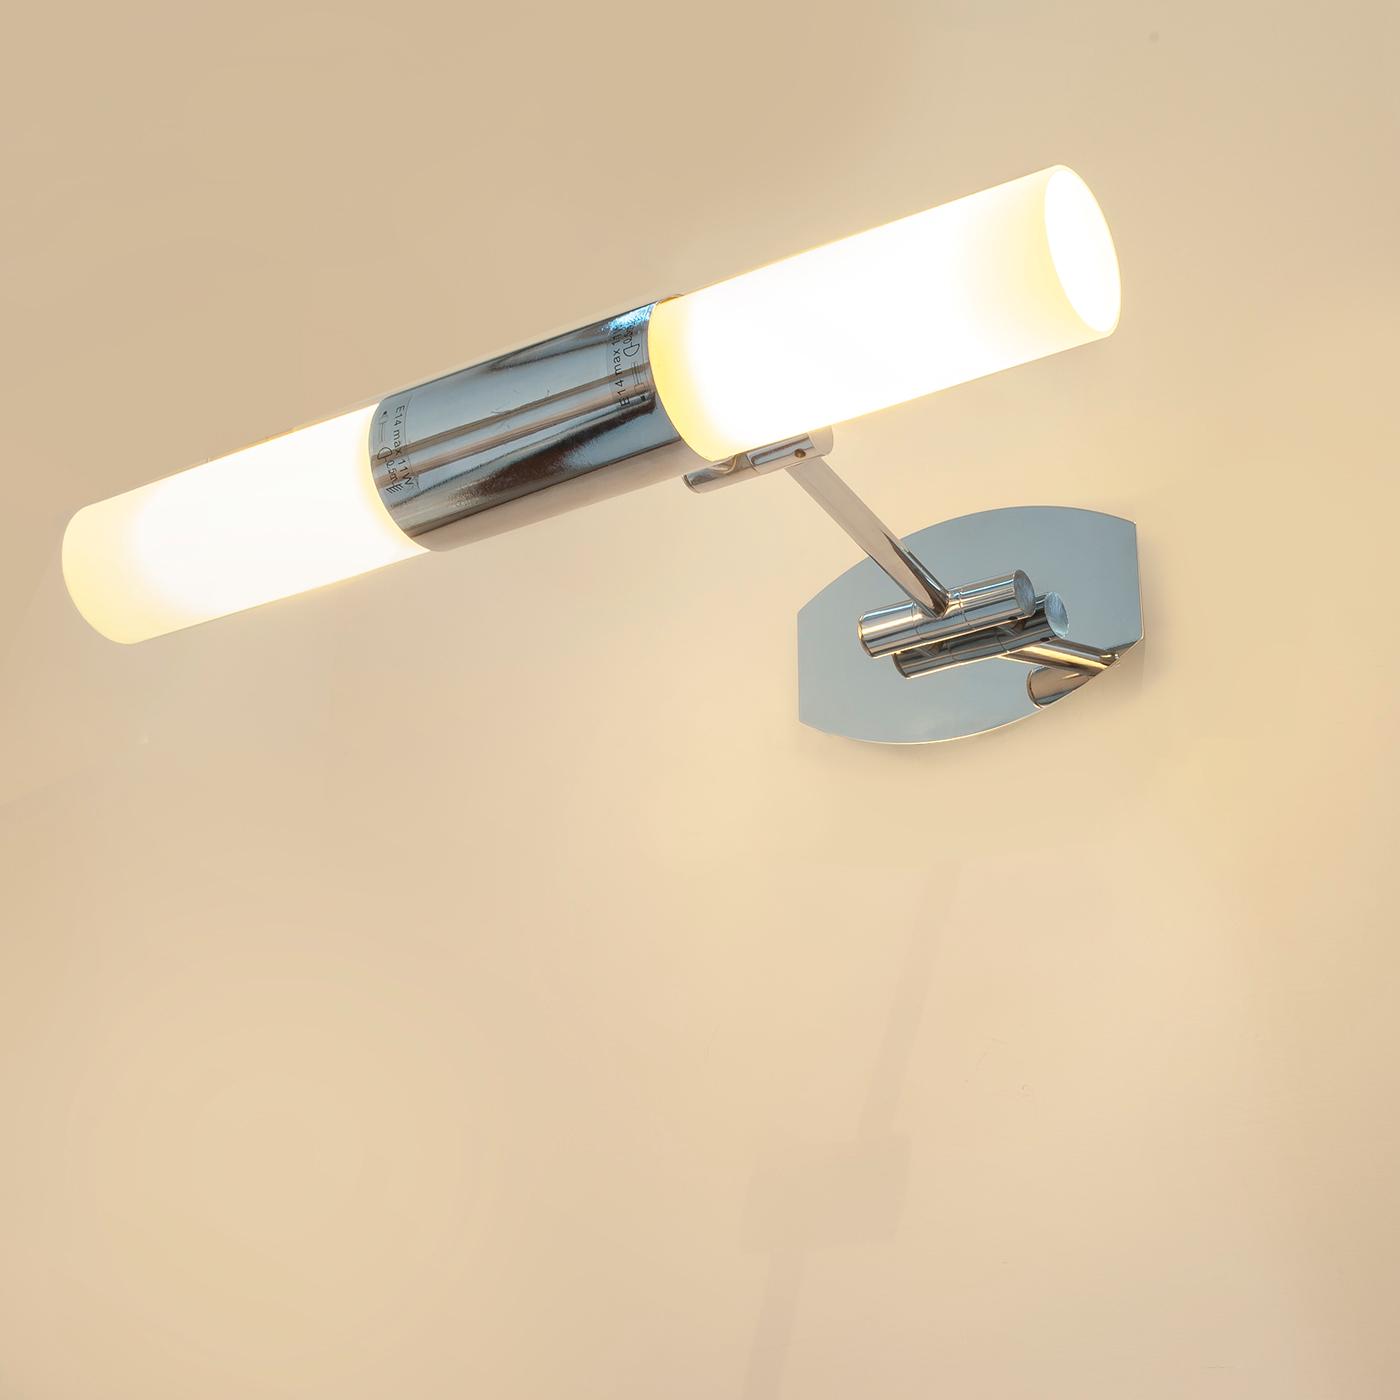 Lampada led da specchio bagno parete applique regolabile luce calda 10w e14  230v